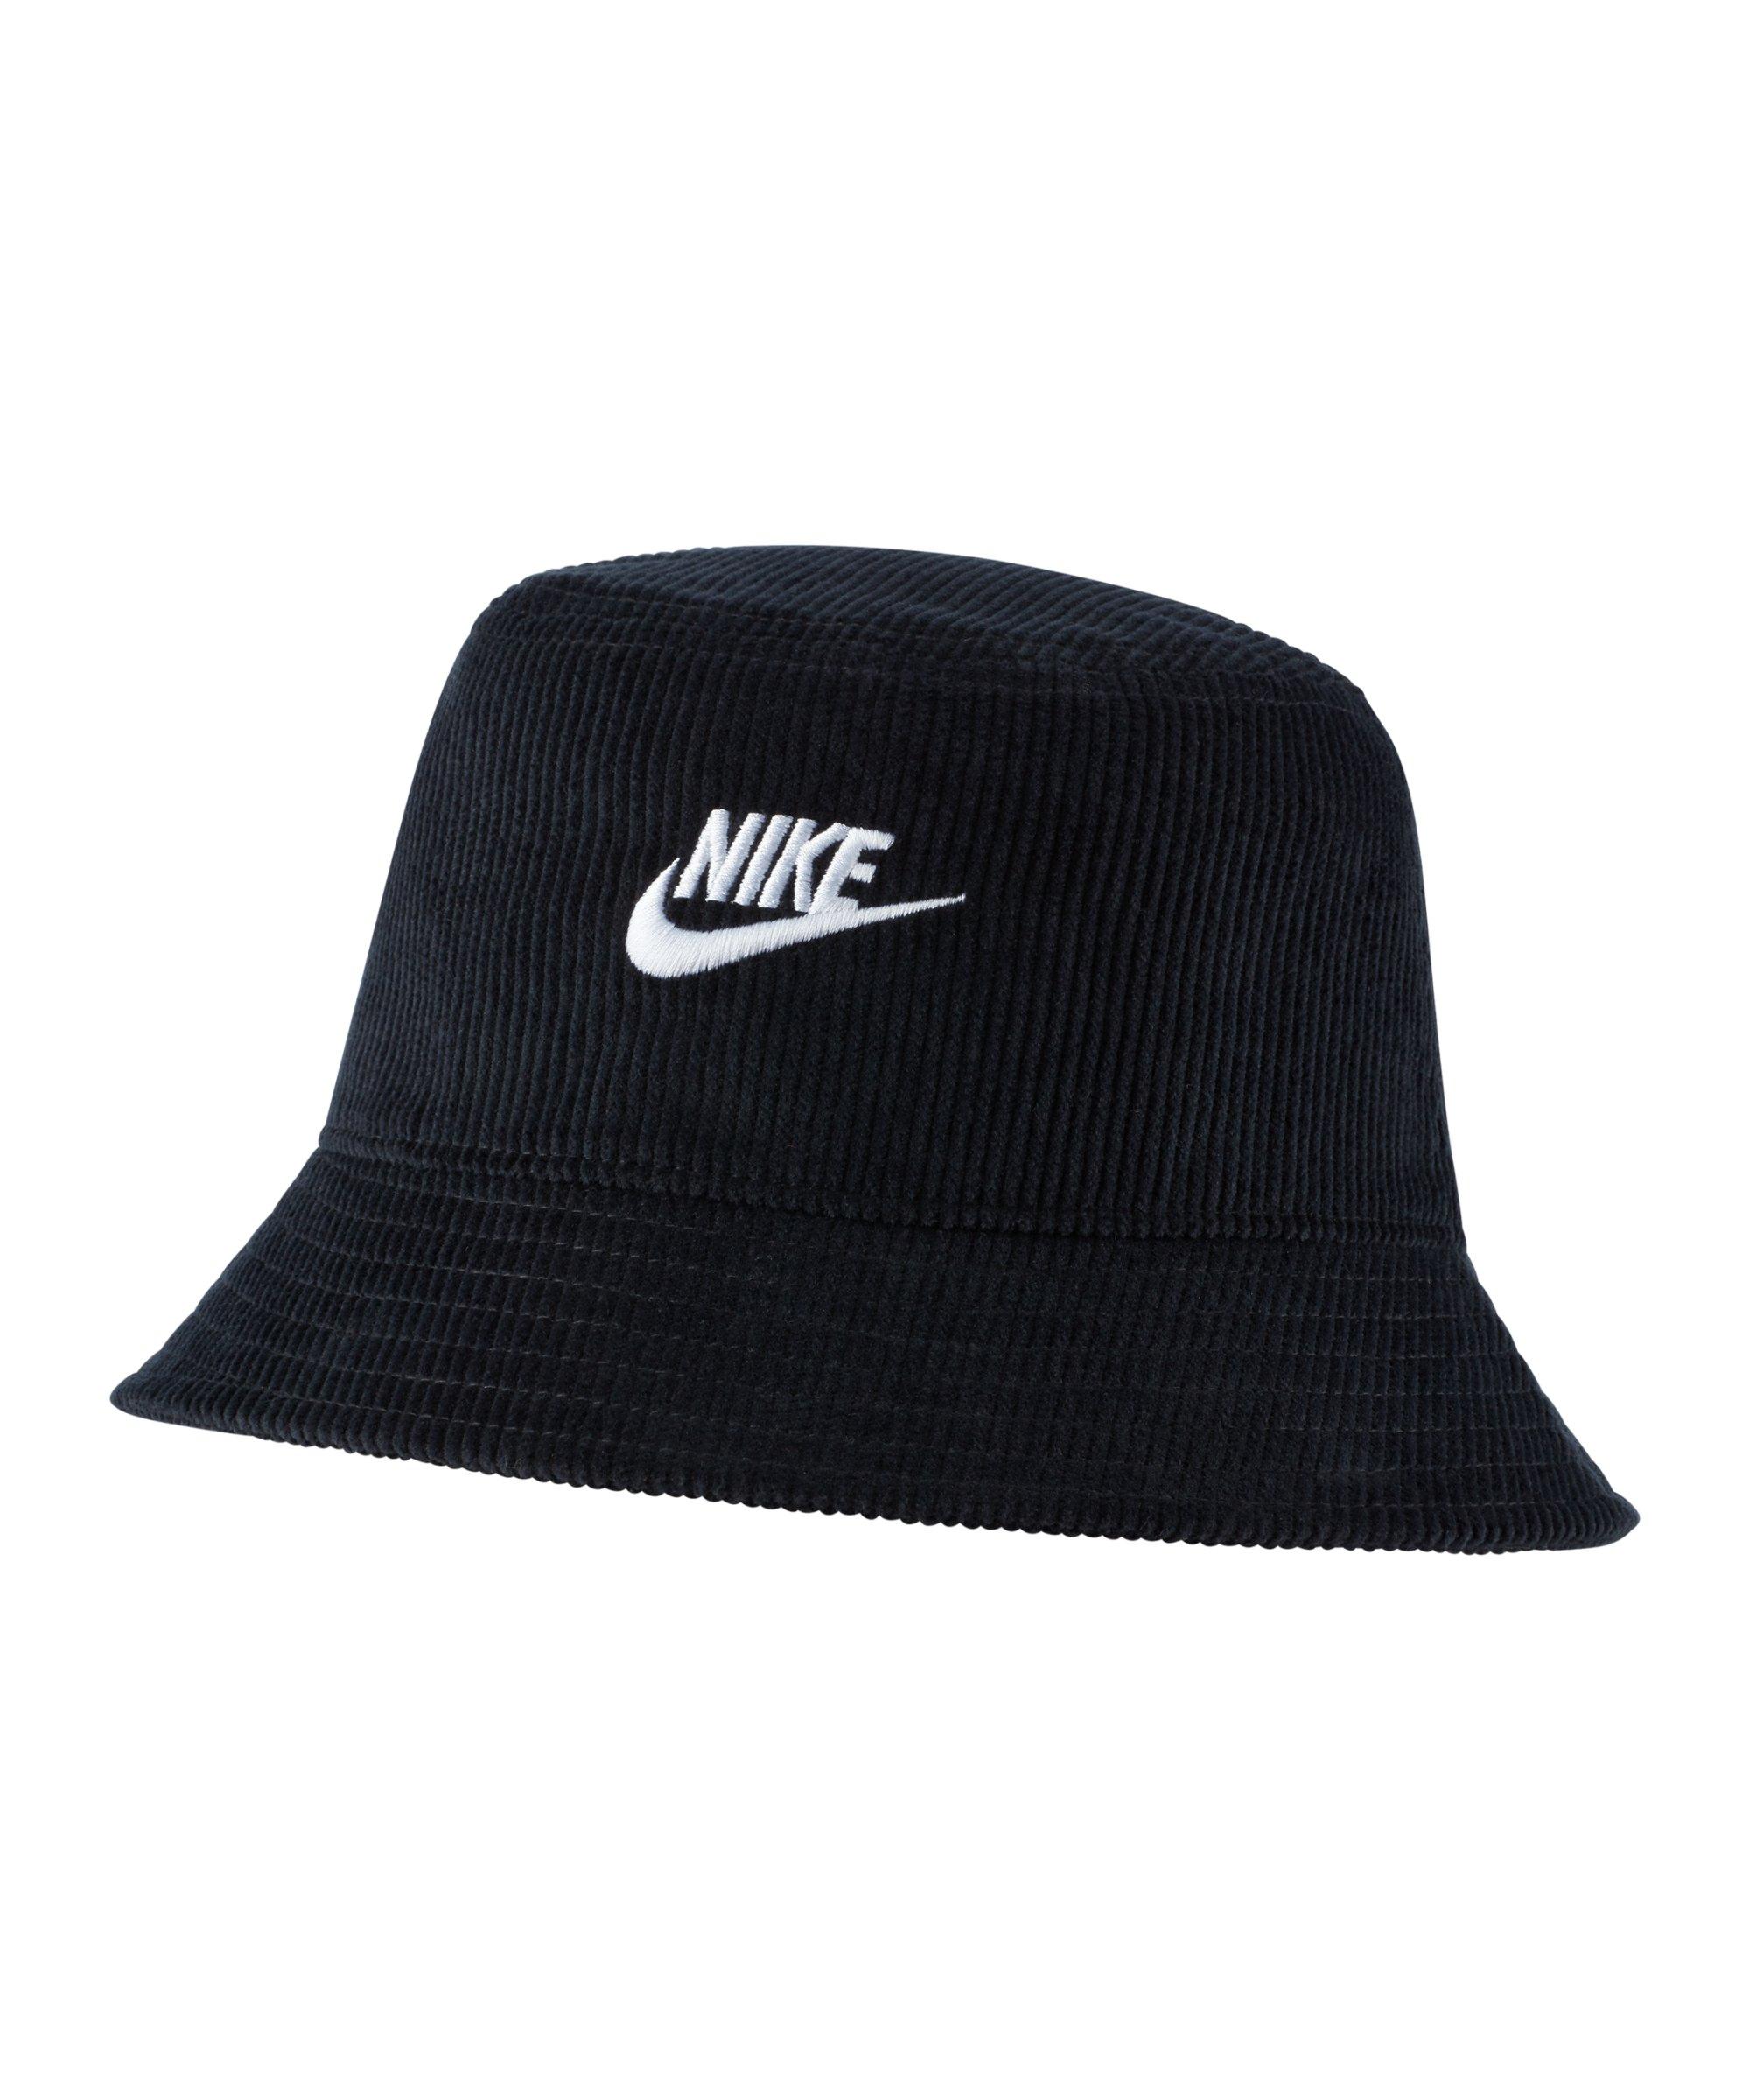 Nike Bucket Hat Schwarz F010 - schwarz